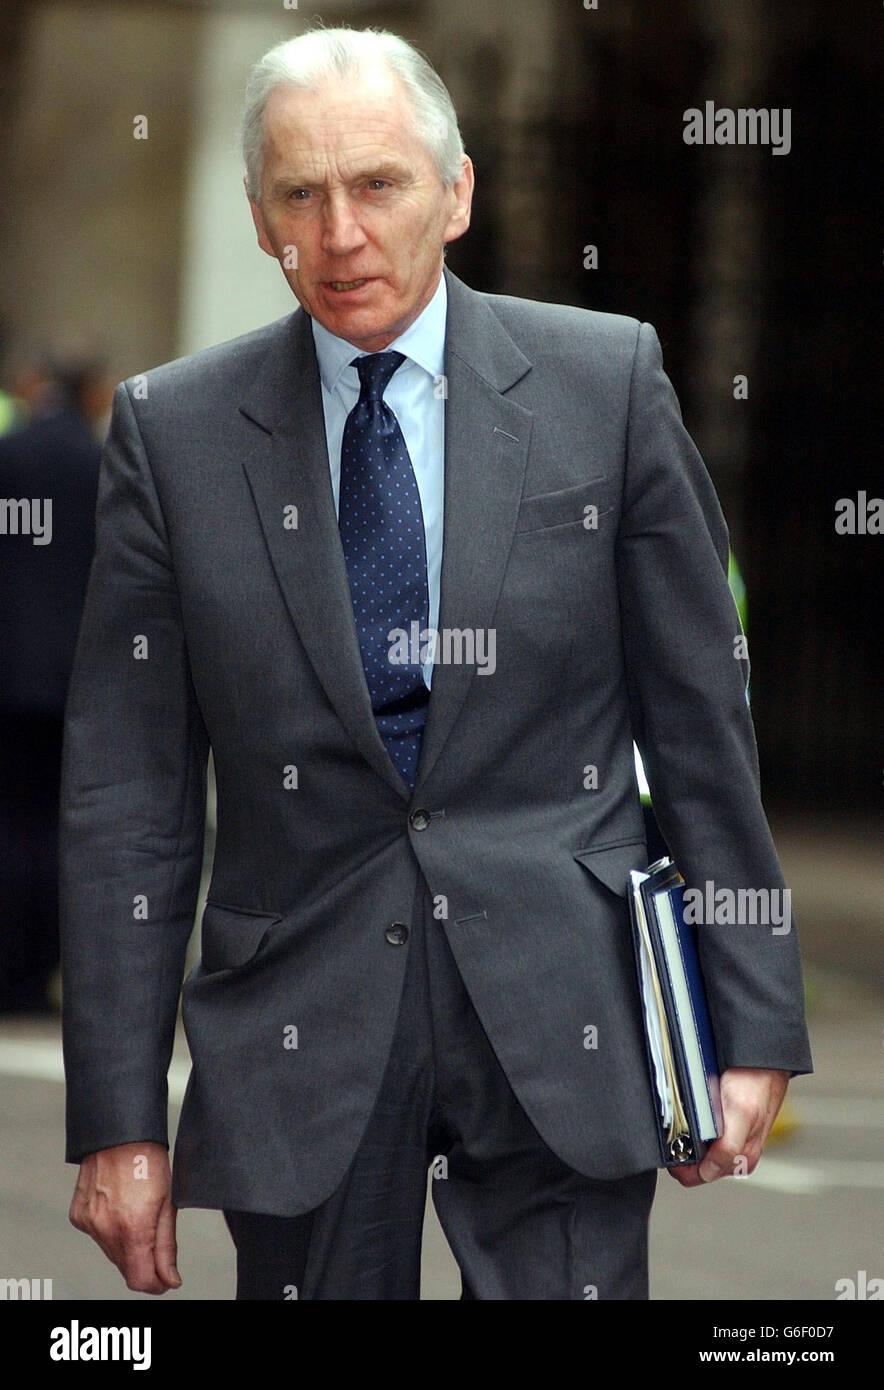 Lord Hutton David Kelly inquiry - Stock Image